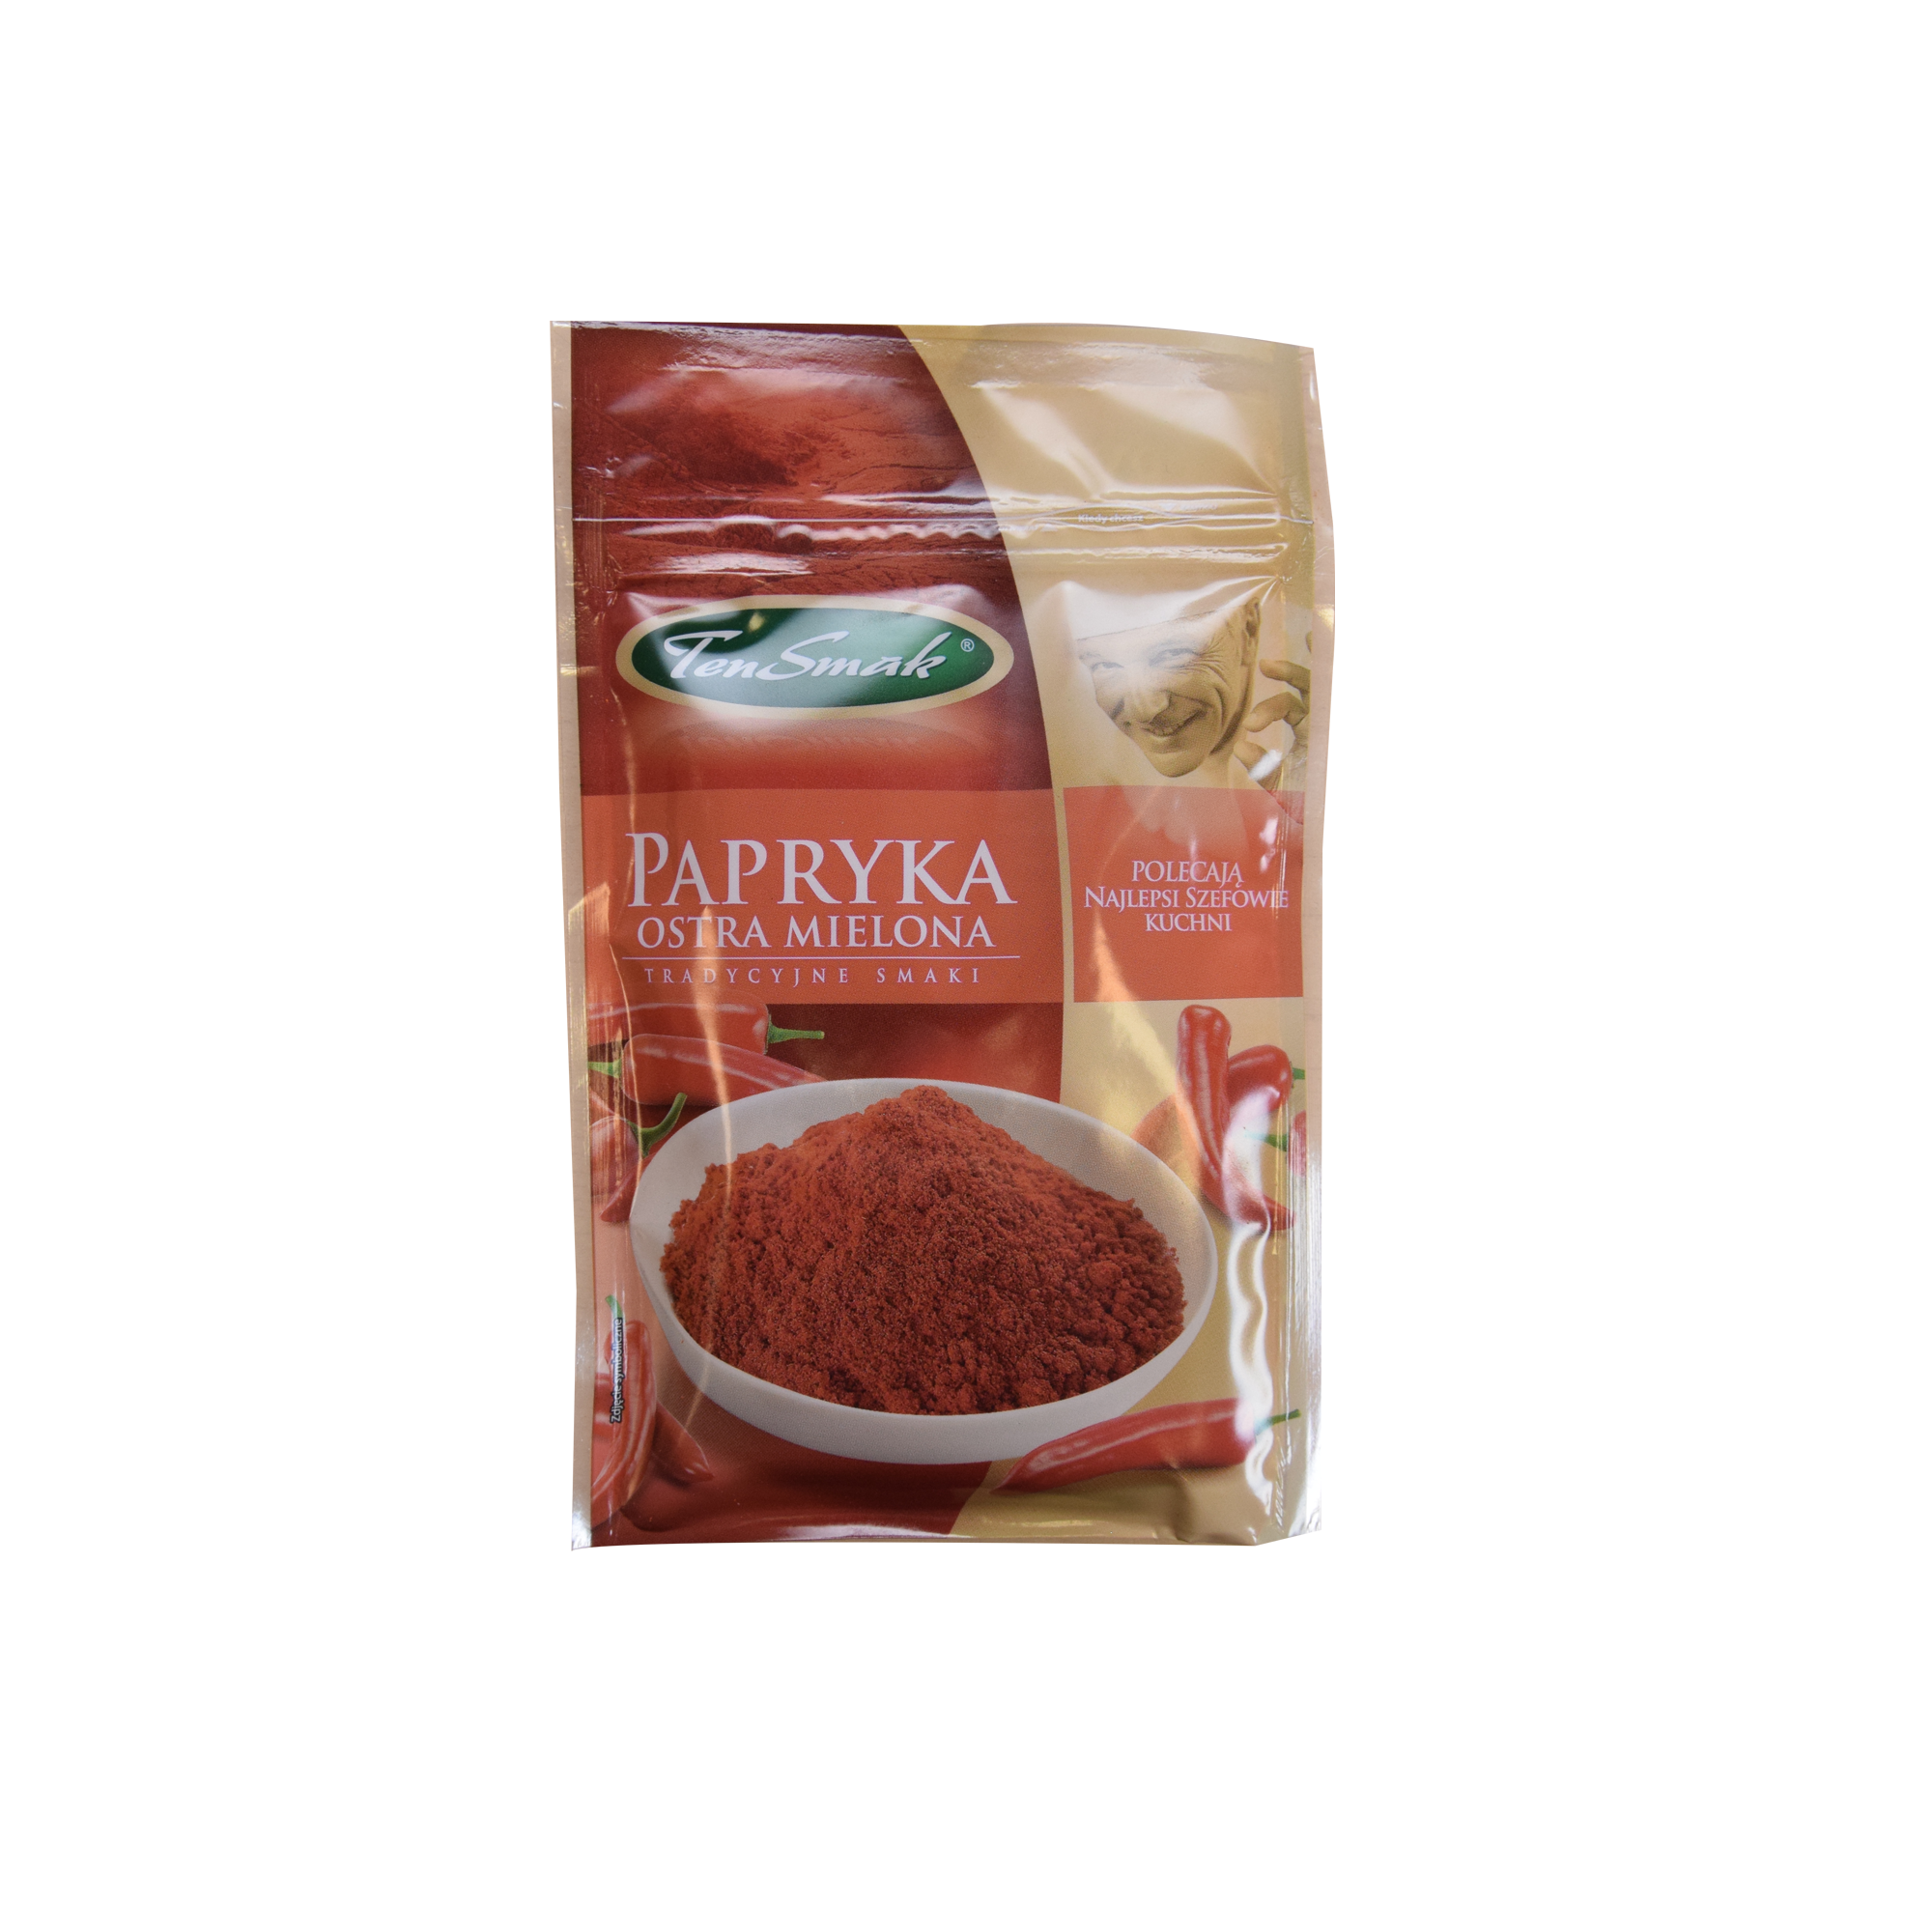 Papryka Ostra 30 G Szczegoly Produktu Emerkury